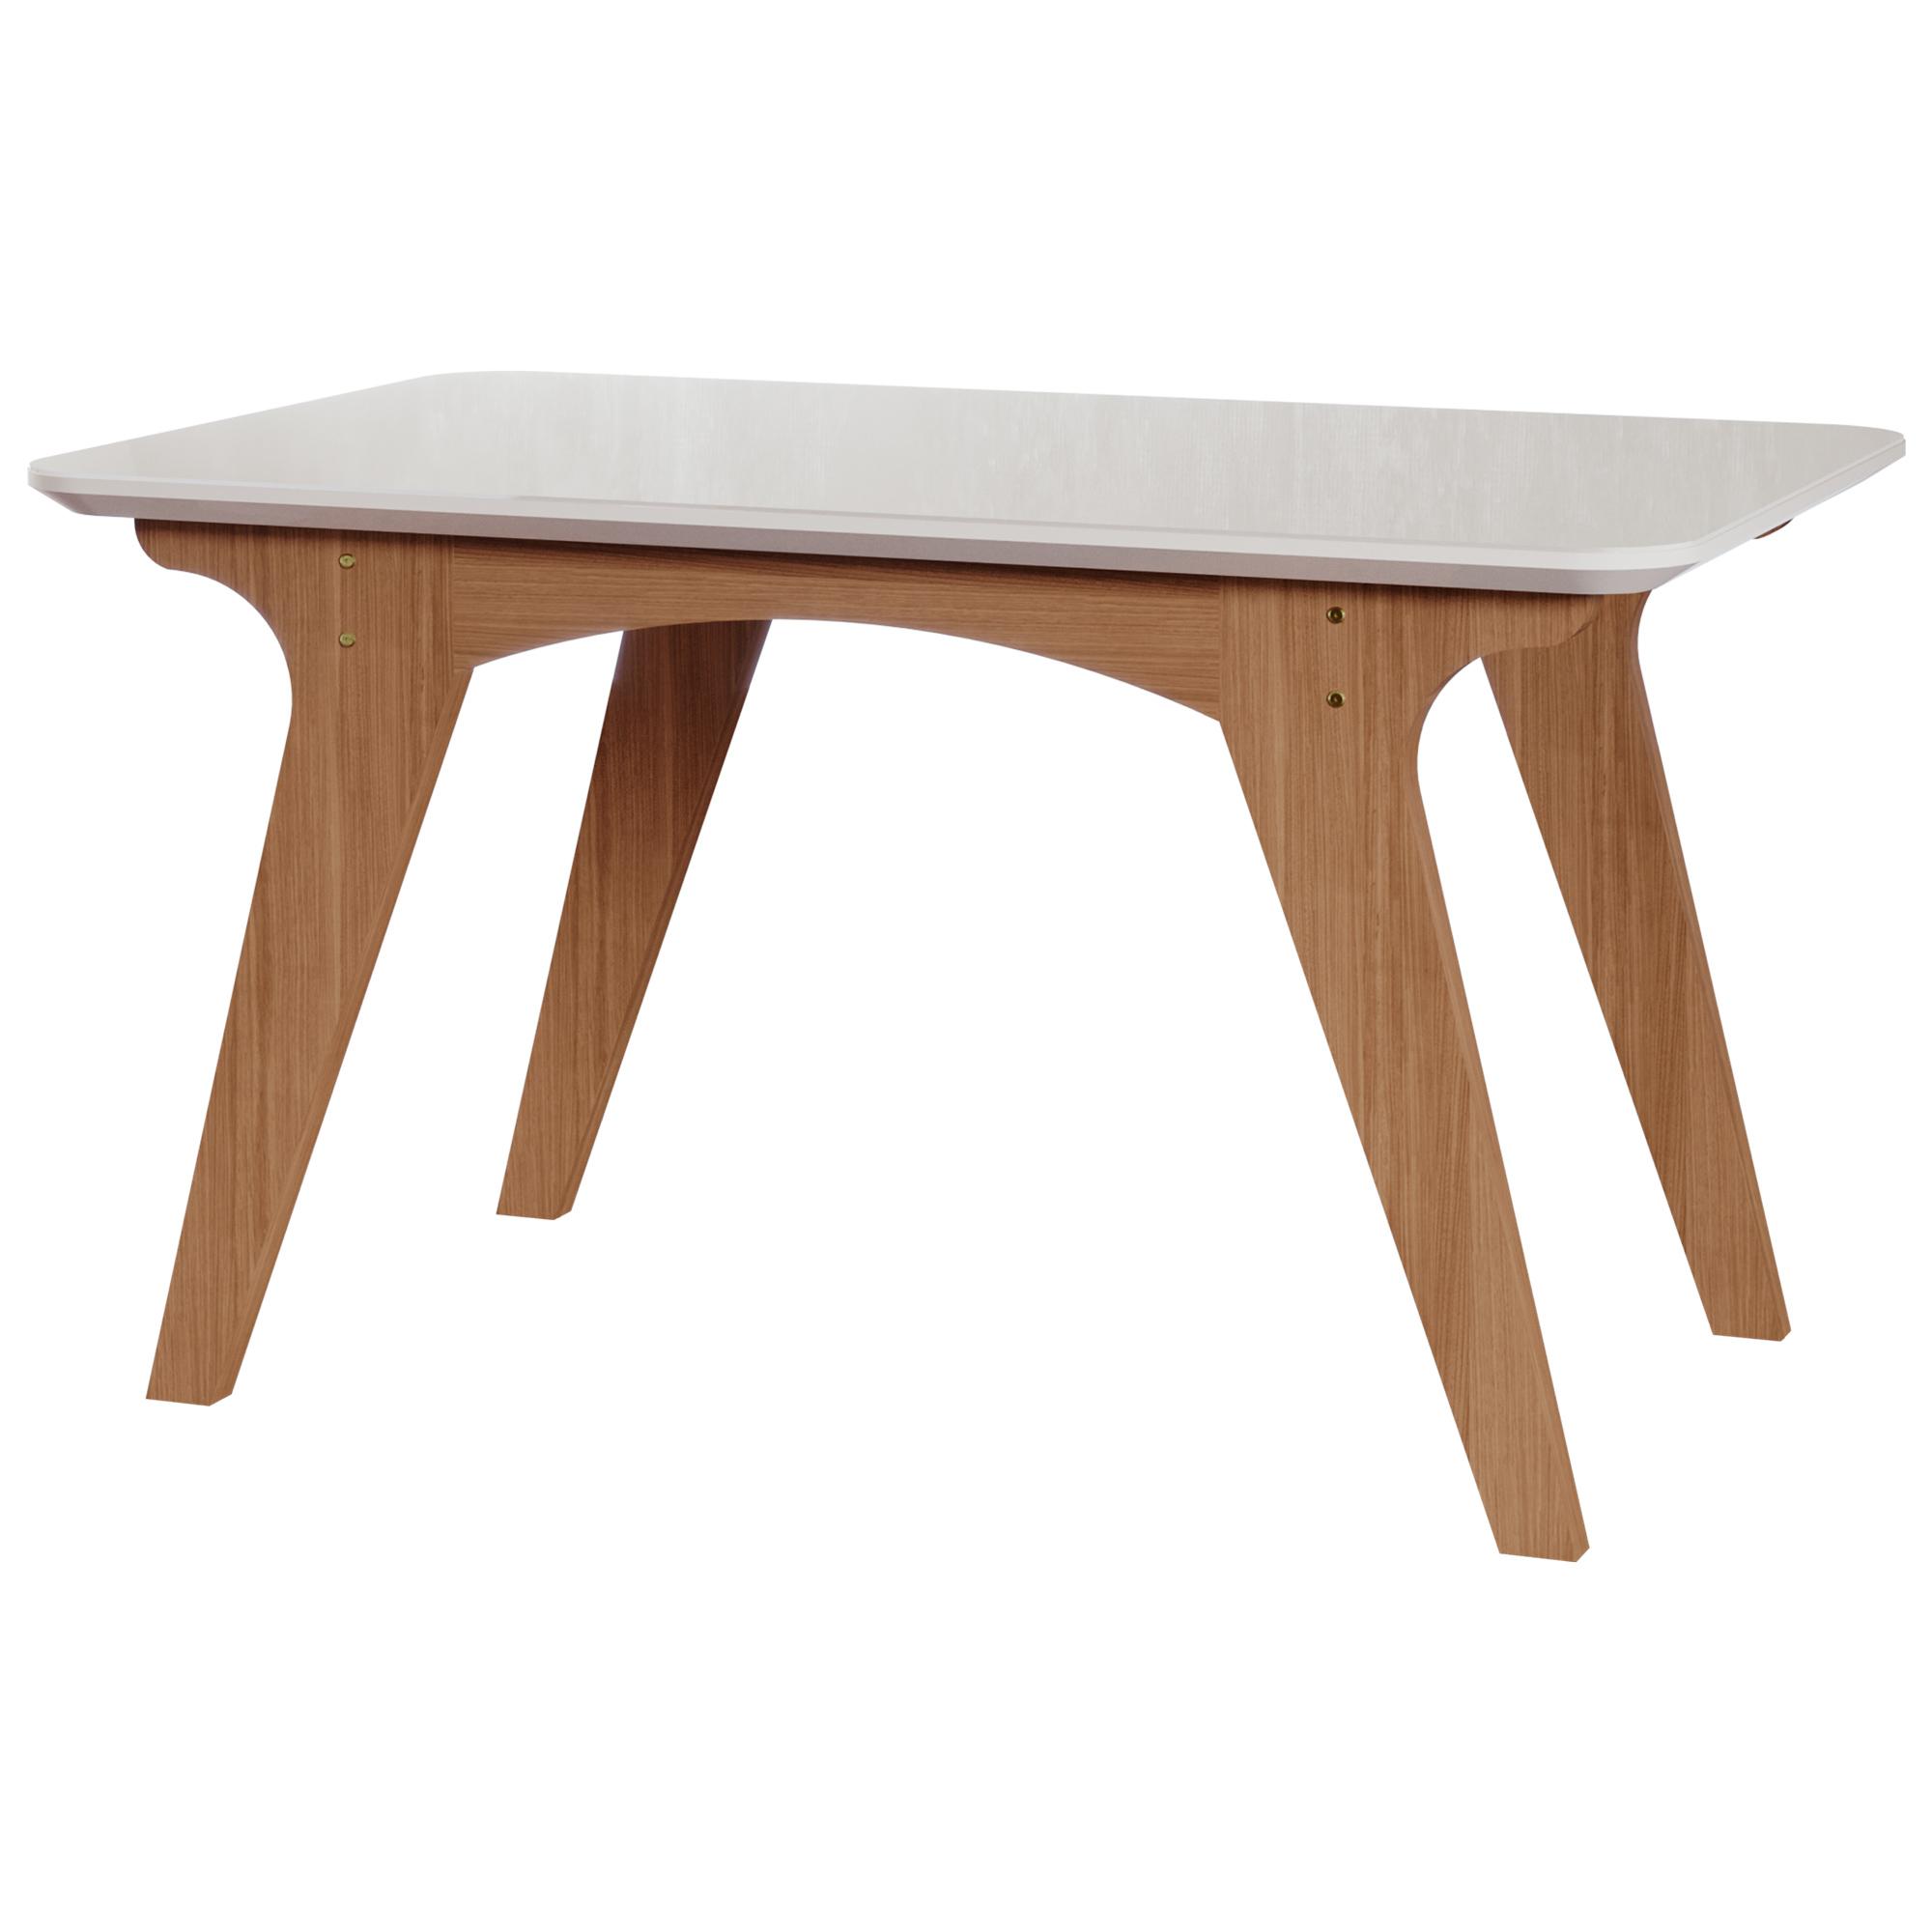 Mesa para Sala de Jantar Mesa Selena 130 cm Vidro/Mdf Cimol Nature/Offwhite